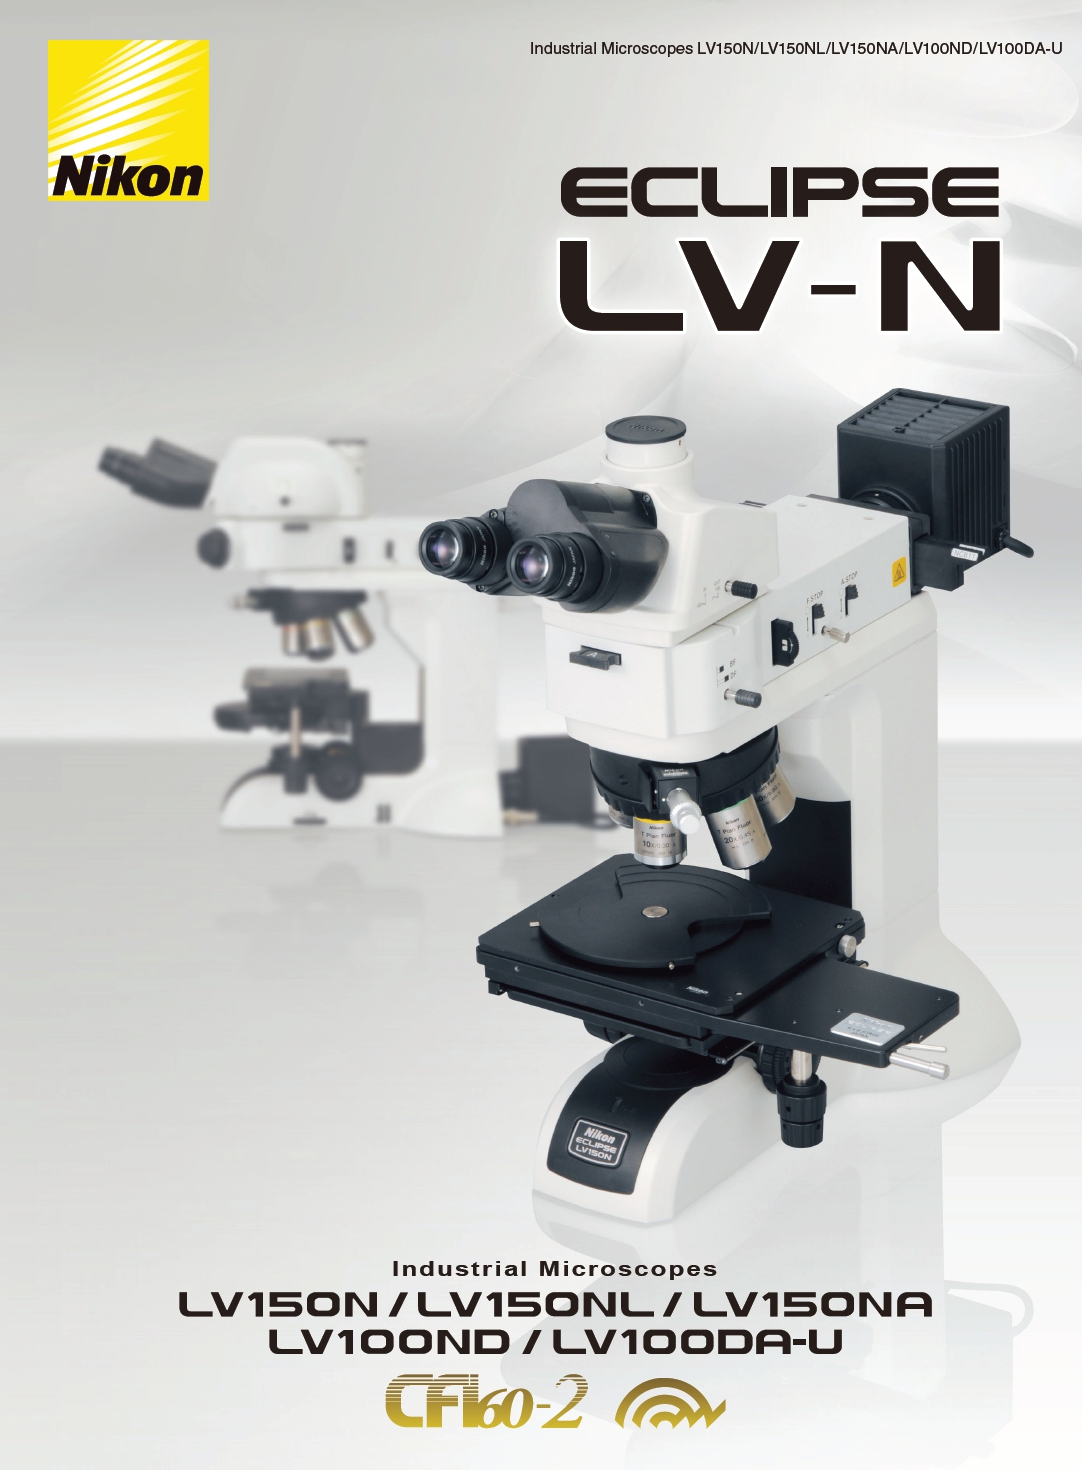 NIKON Industrial microscopes